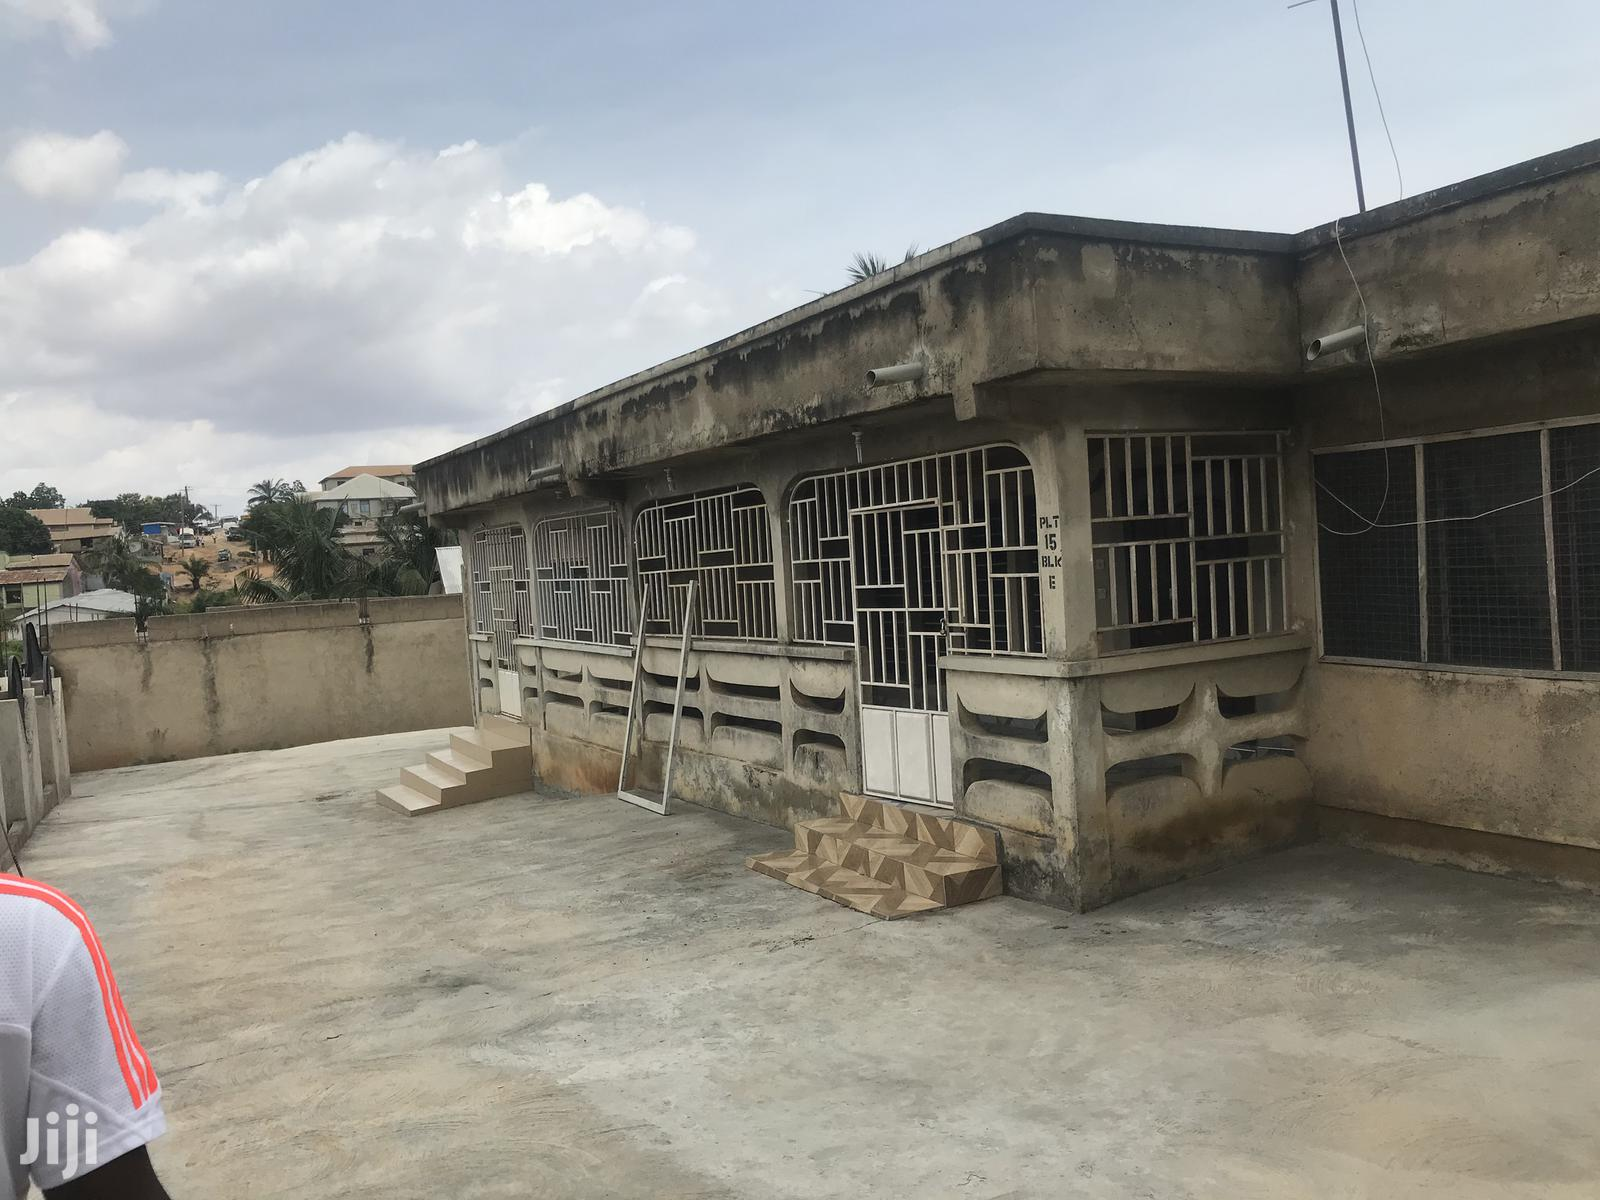 House for Sale at Kumasi Buoho Gh 160,000 | Houses & Apartments For Sale for sale in Kumasi Metropolitan, Ashanti, Ghana